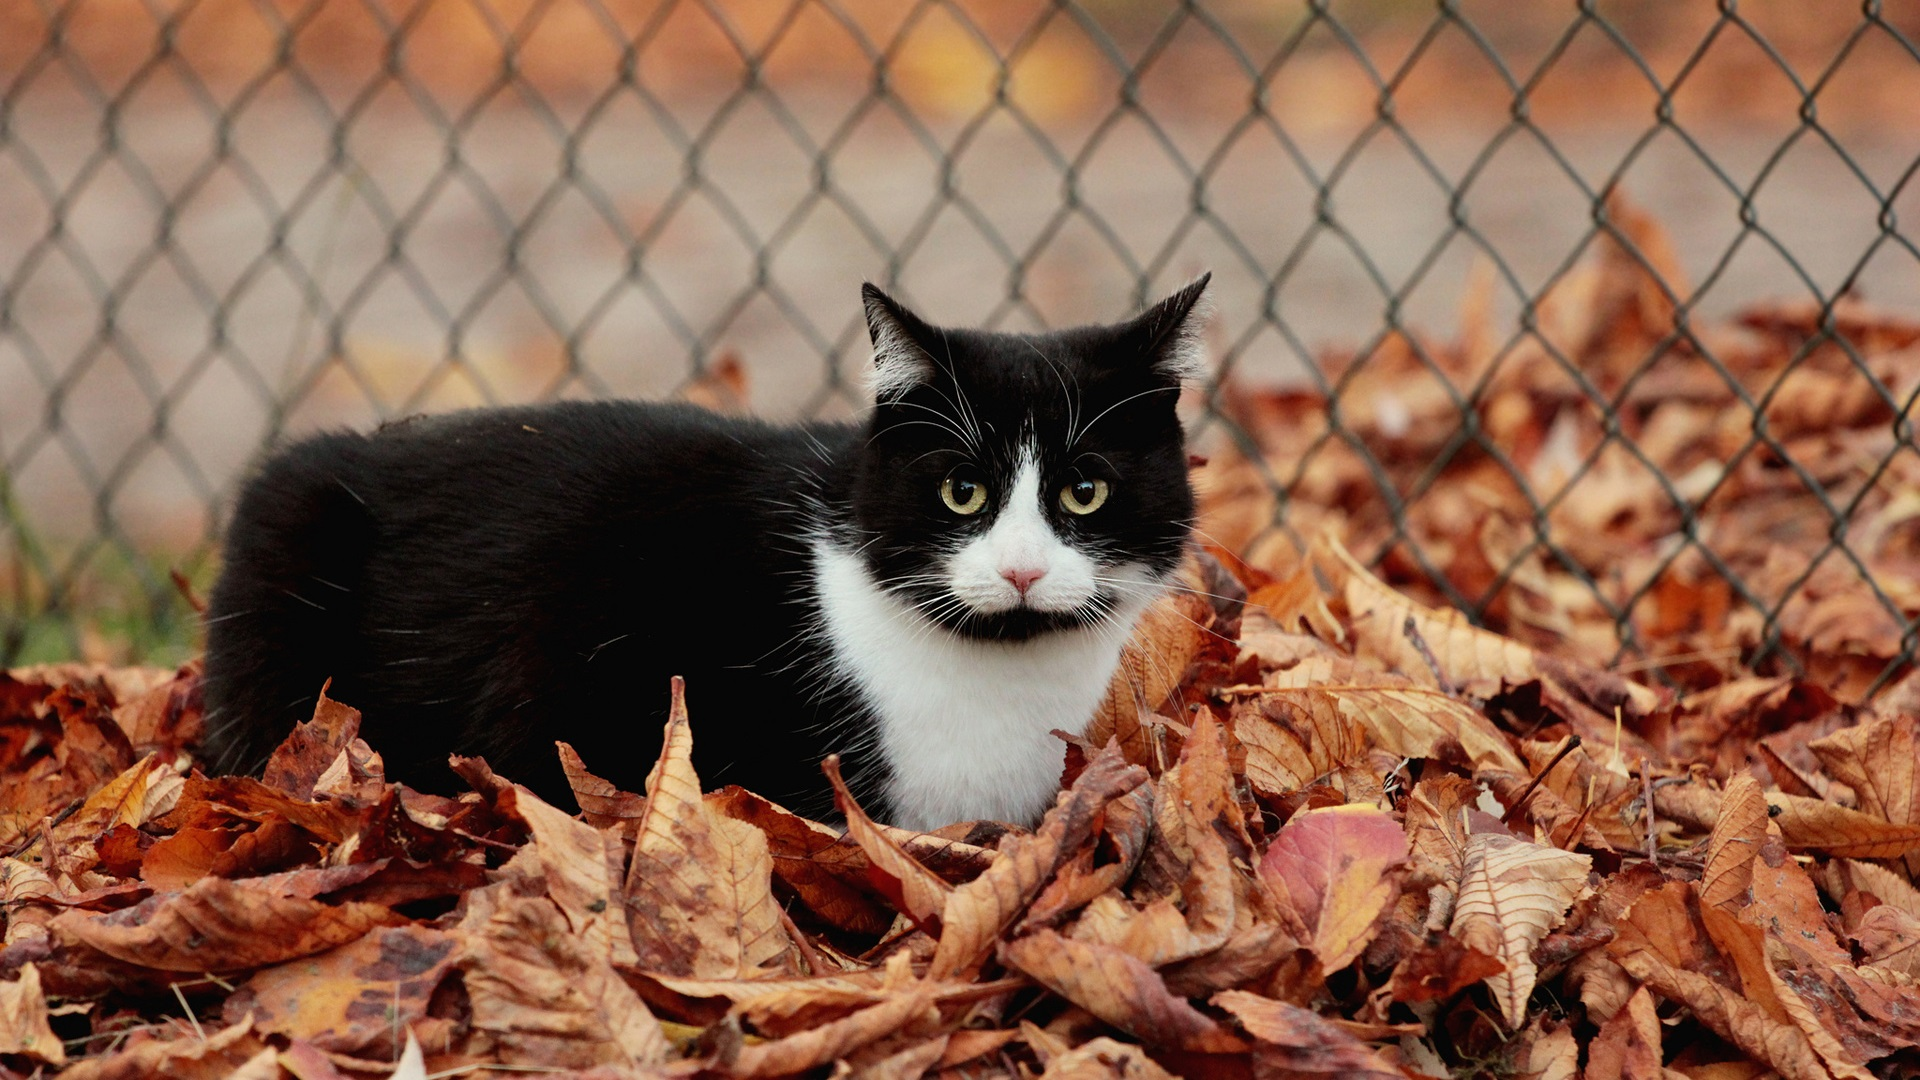 Fence-leaves-autumn-black-and-white-cat_1920x1080.jpg: ja.best-wallpaper.net/Fence-leaves-autumn-black-and-white-cat...